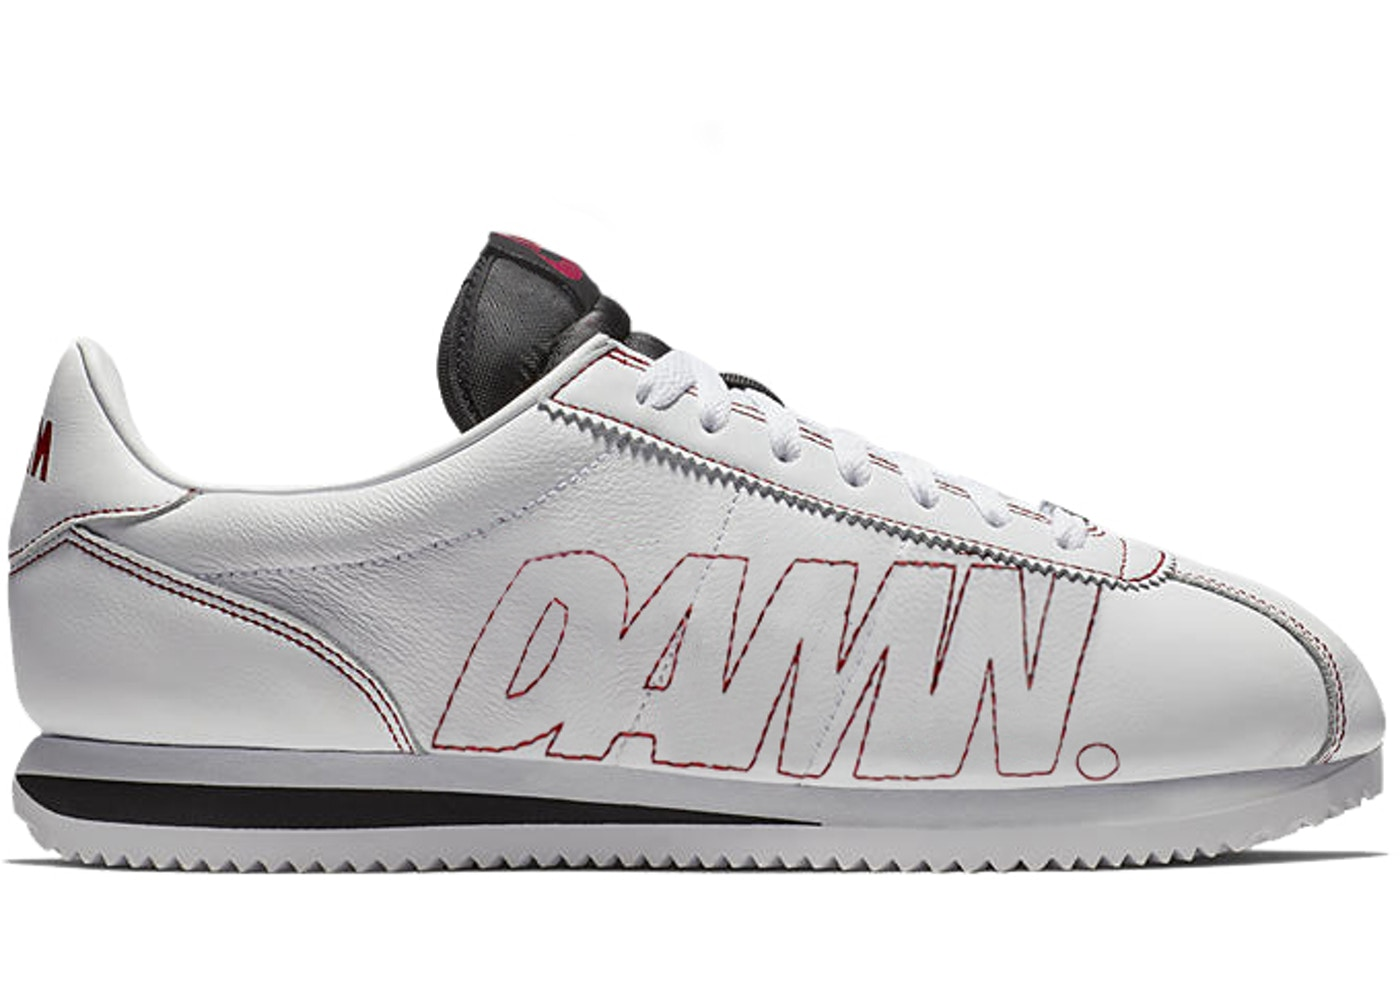 84556cca9e6 HypeAnalyzer · Nike Cortez Kenny 1 Kendrick Lamar Damn White Gym Red